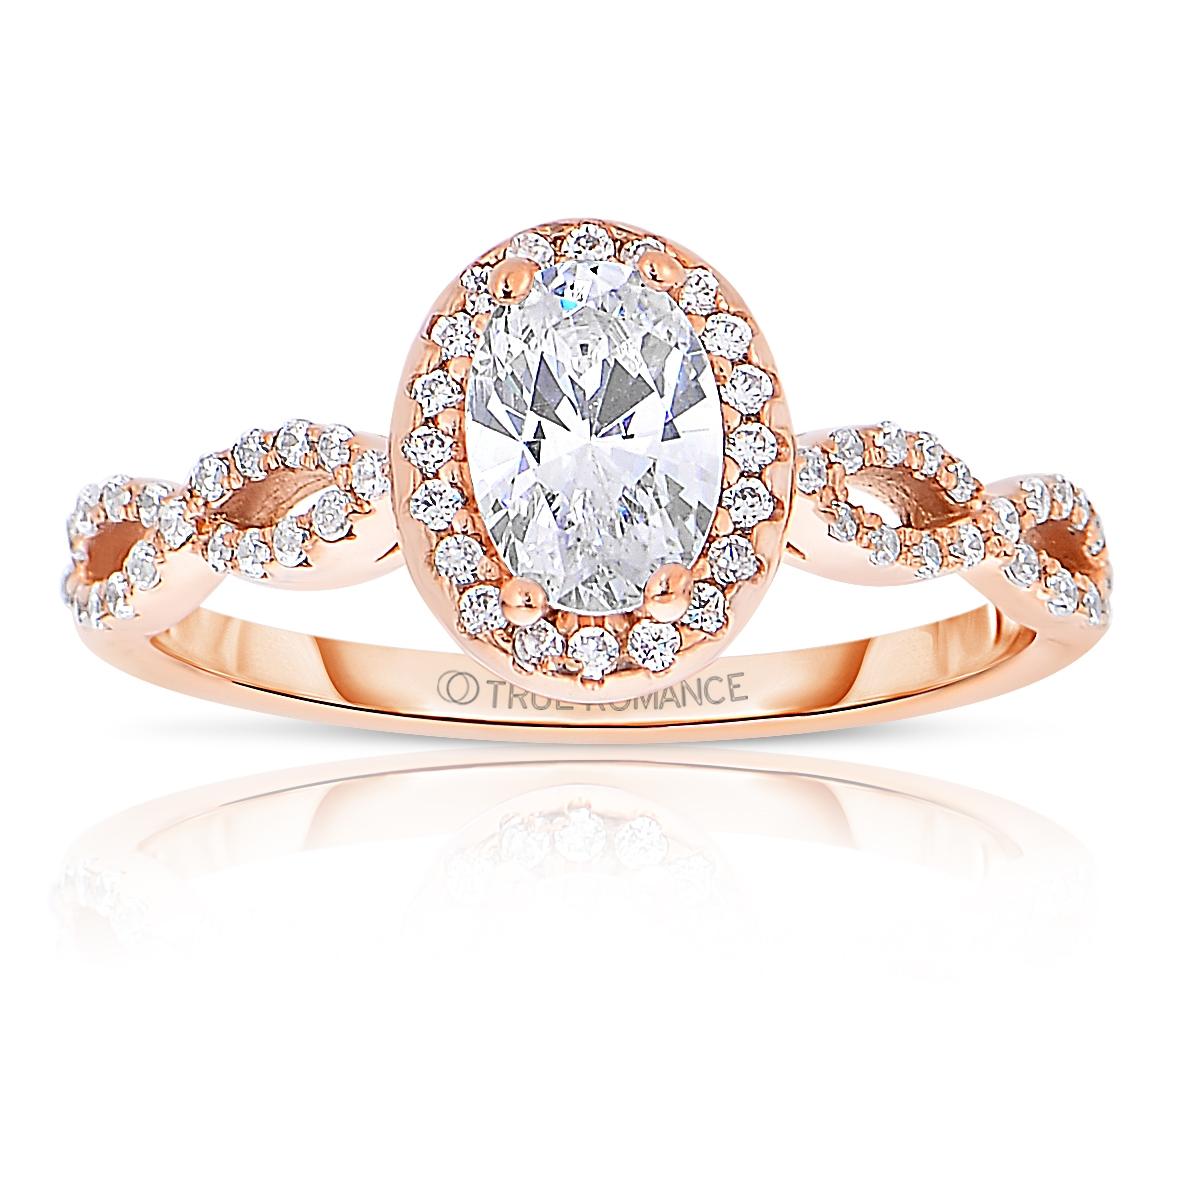 Kingoffs Jewelers Diamonds and Fine Jewelry